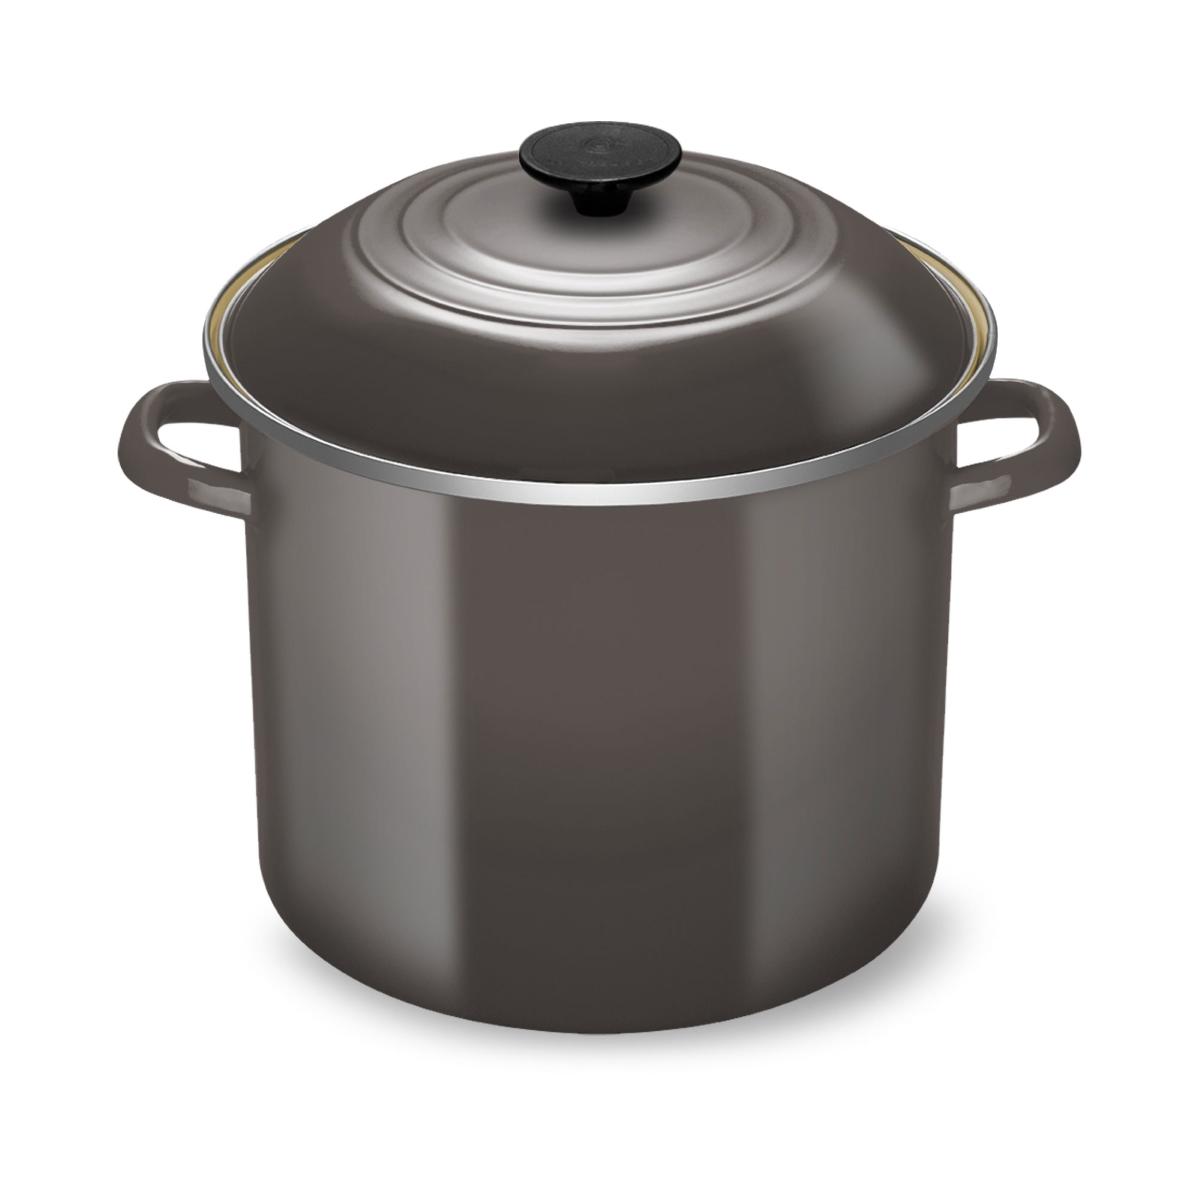 Le Creuset Enameled Steel 10-quart Oyster Stock Pot